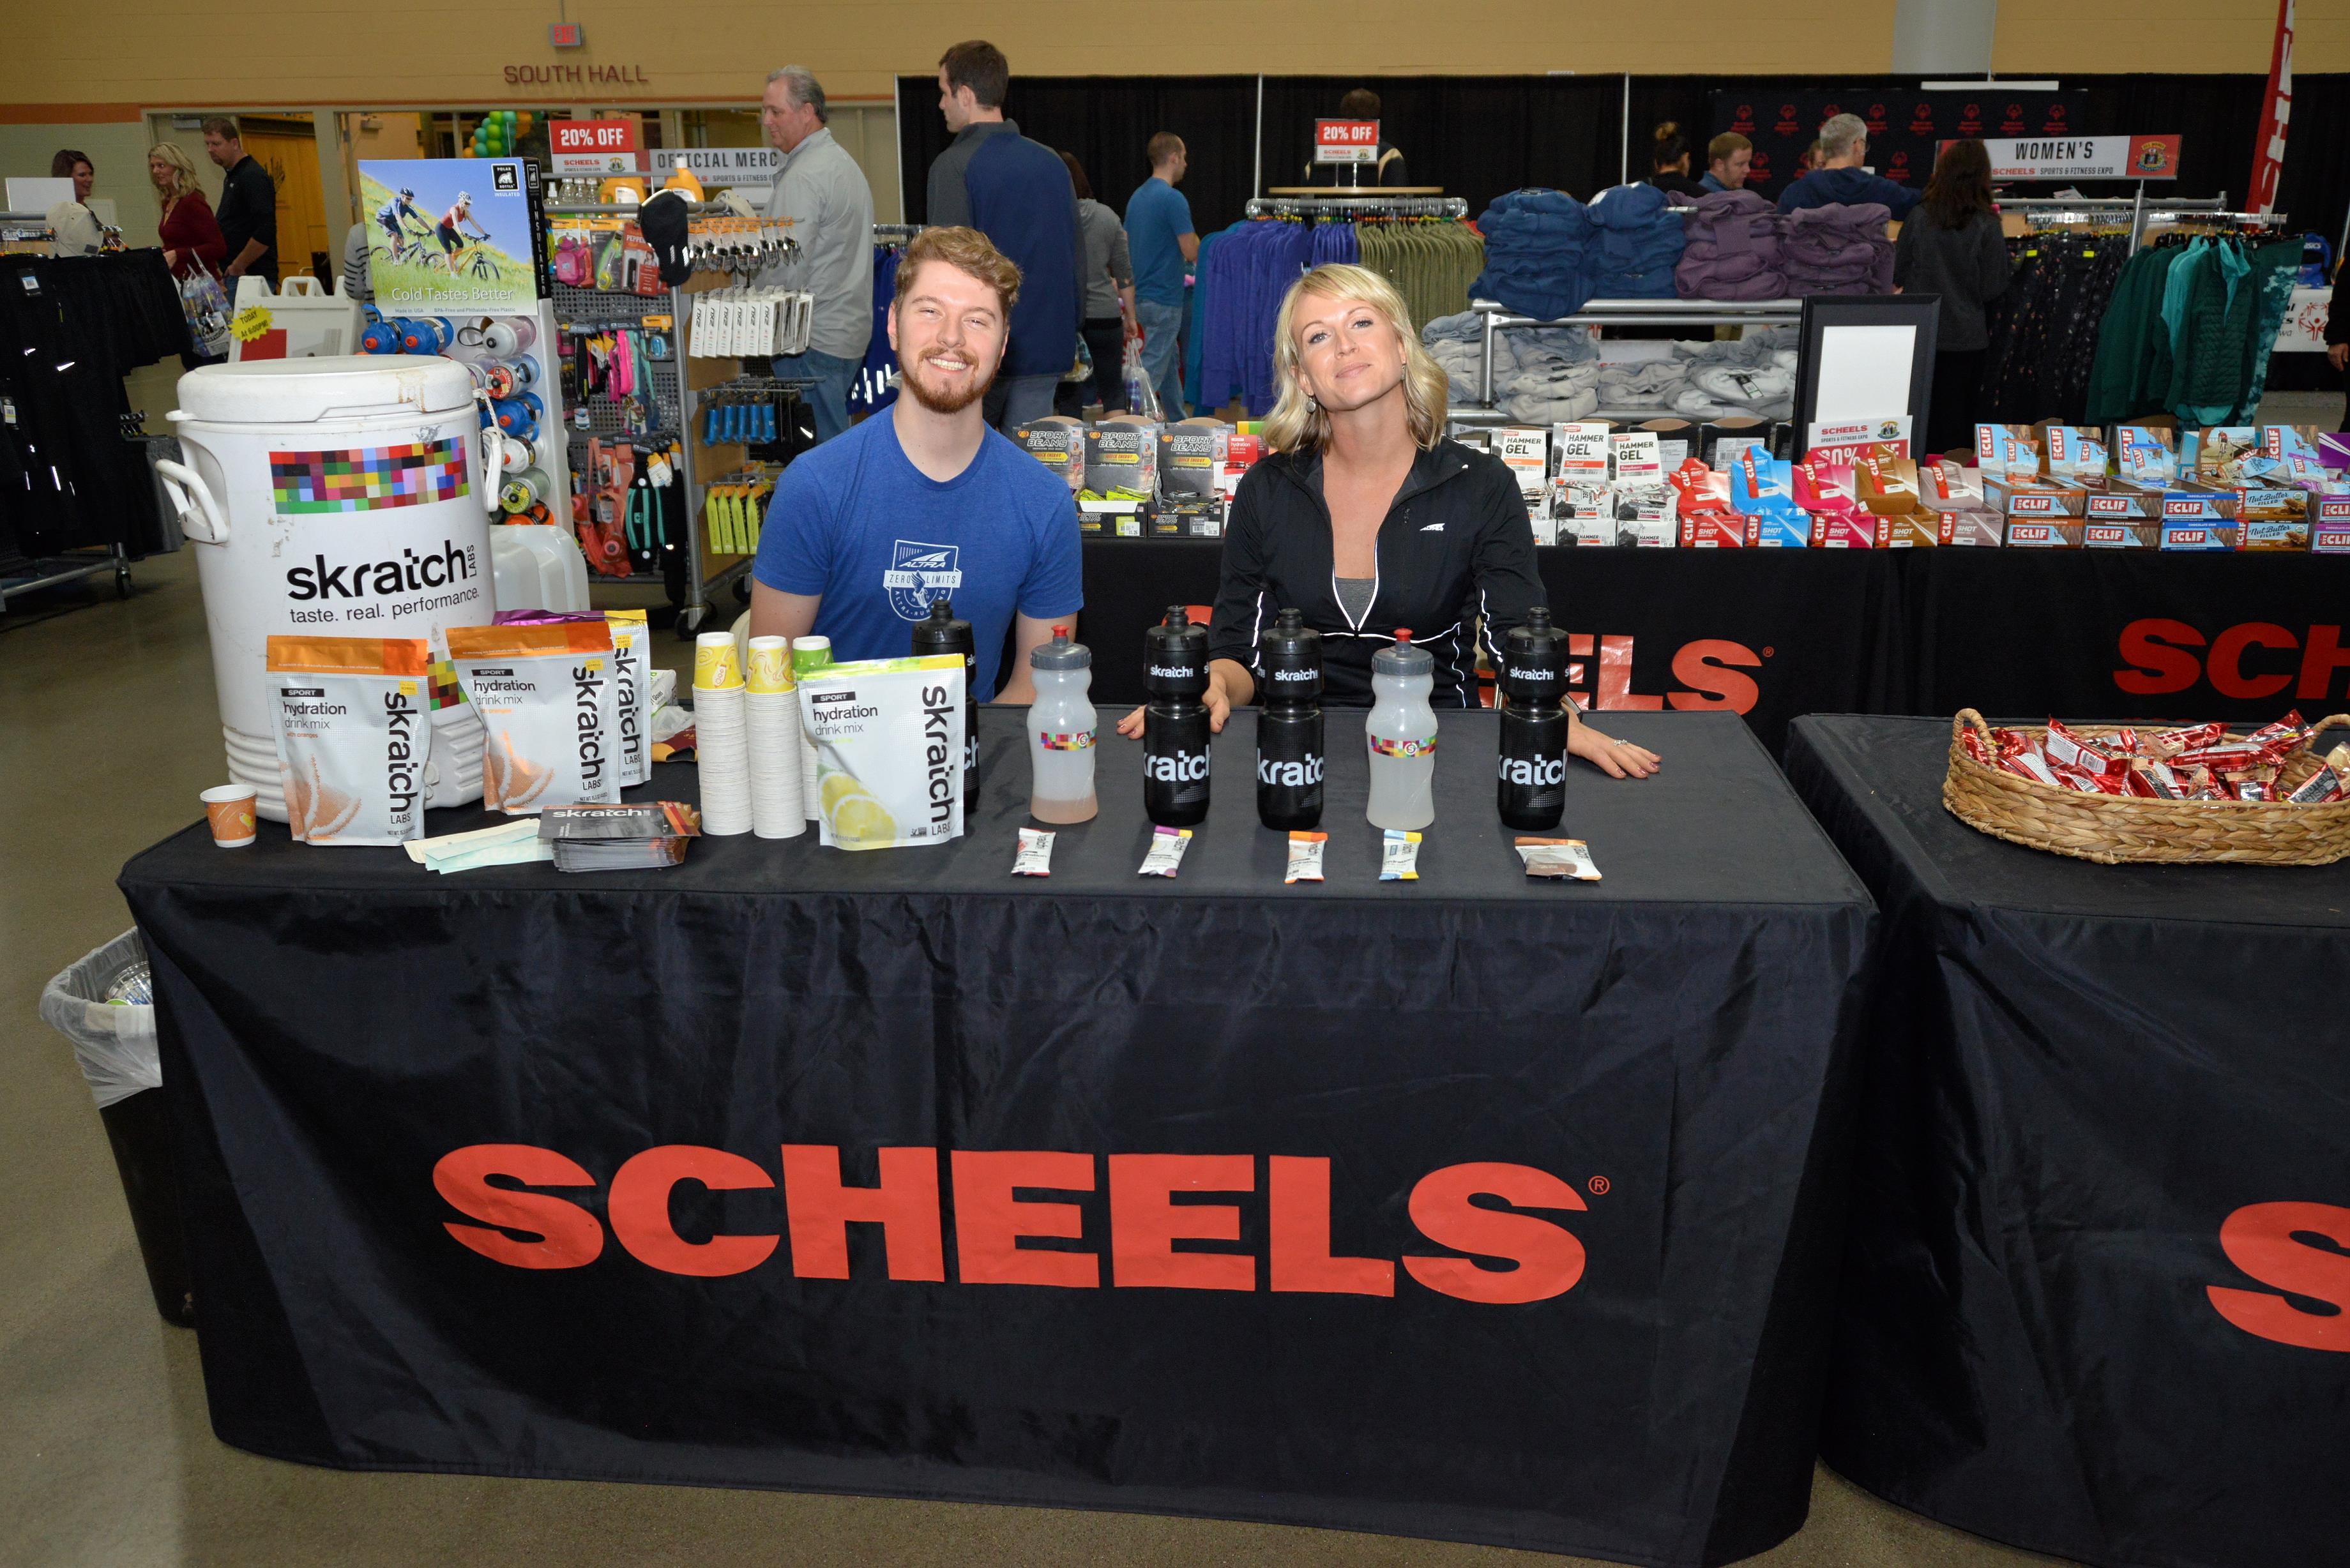 Scheels Sports & Fitness Expo